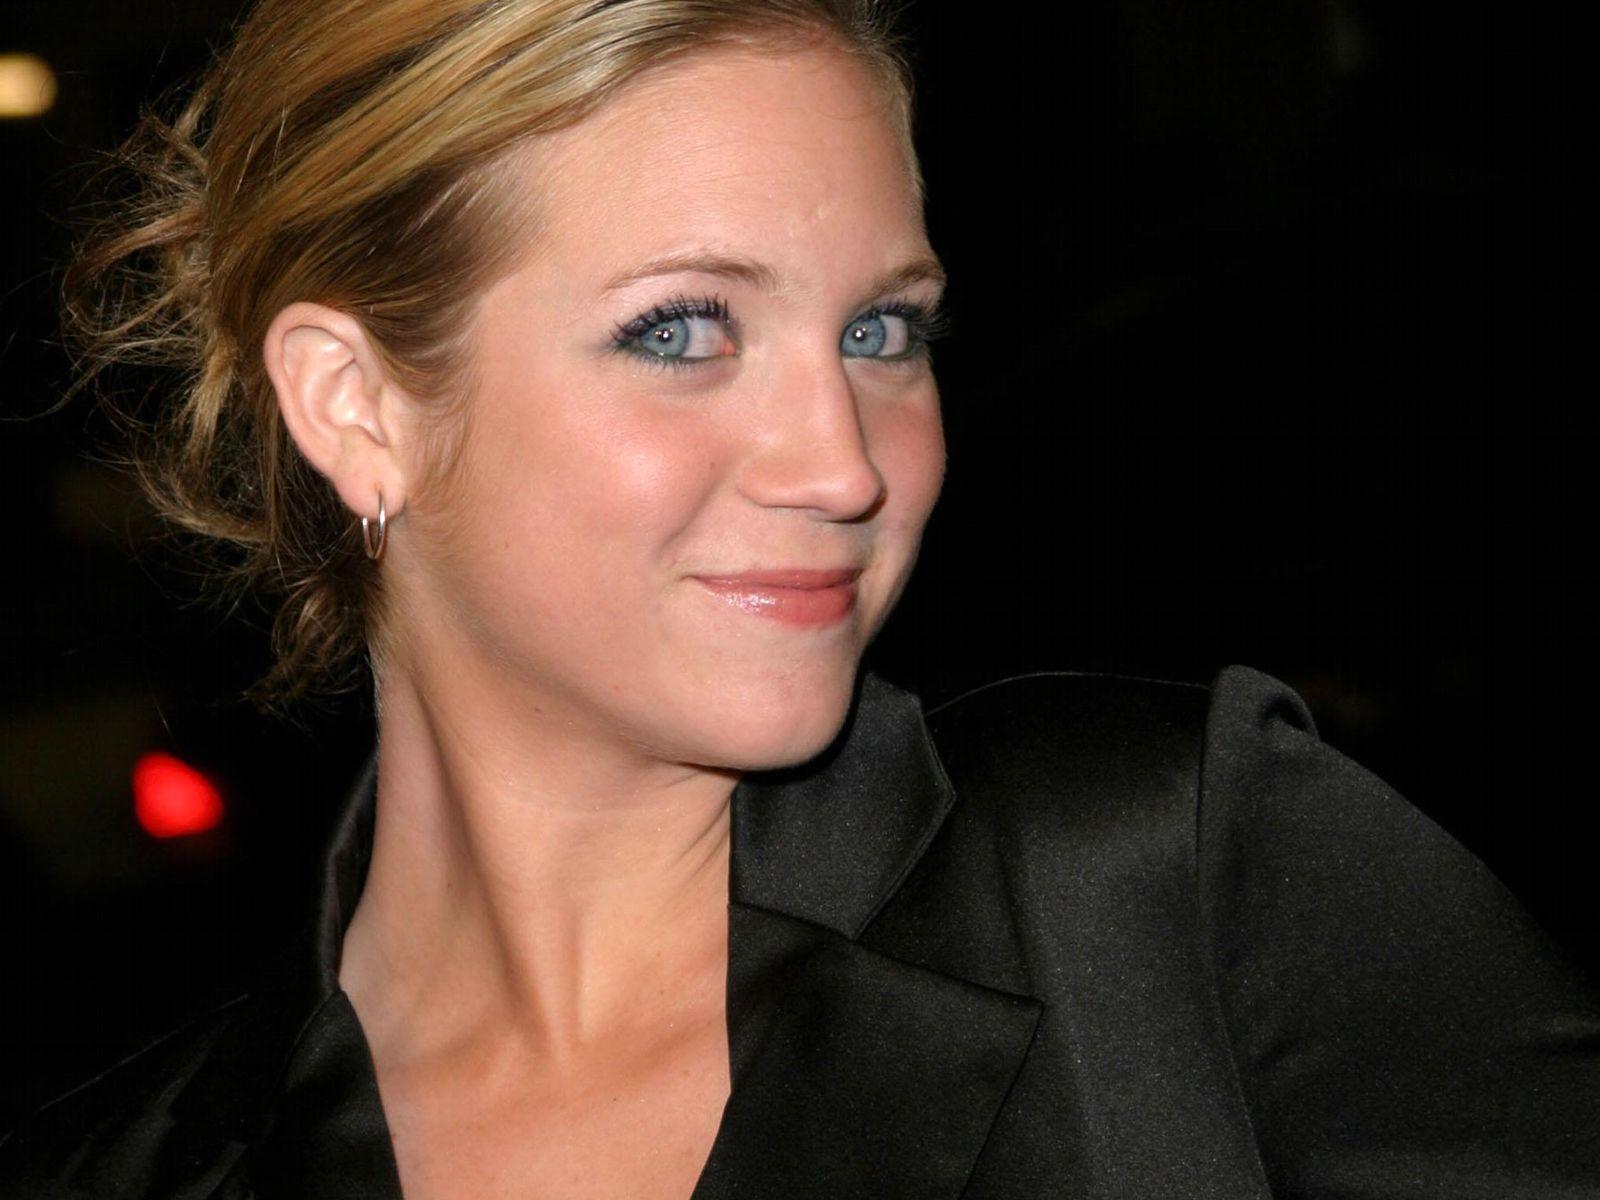 http://2.bp.blogspot.com/-gz5M2CZU1ic/T1EFS85ba2I/AAAAAAAABF4/yke50GTxCpQ/s1600/0001-Brittany_Snow_1.jpg